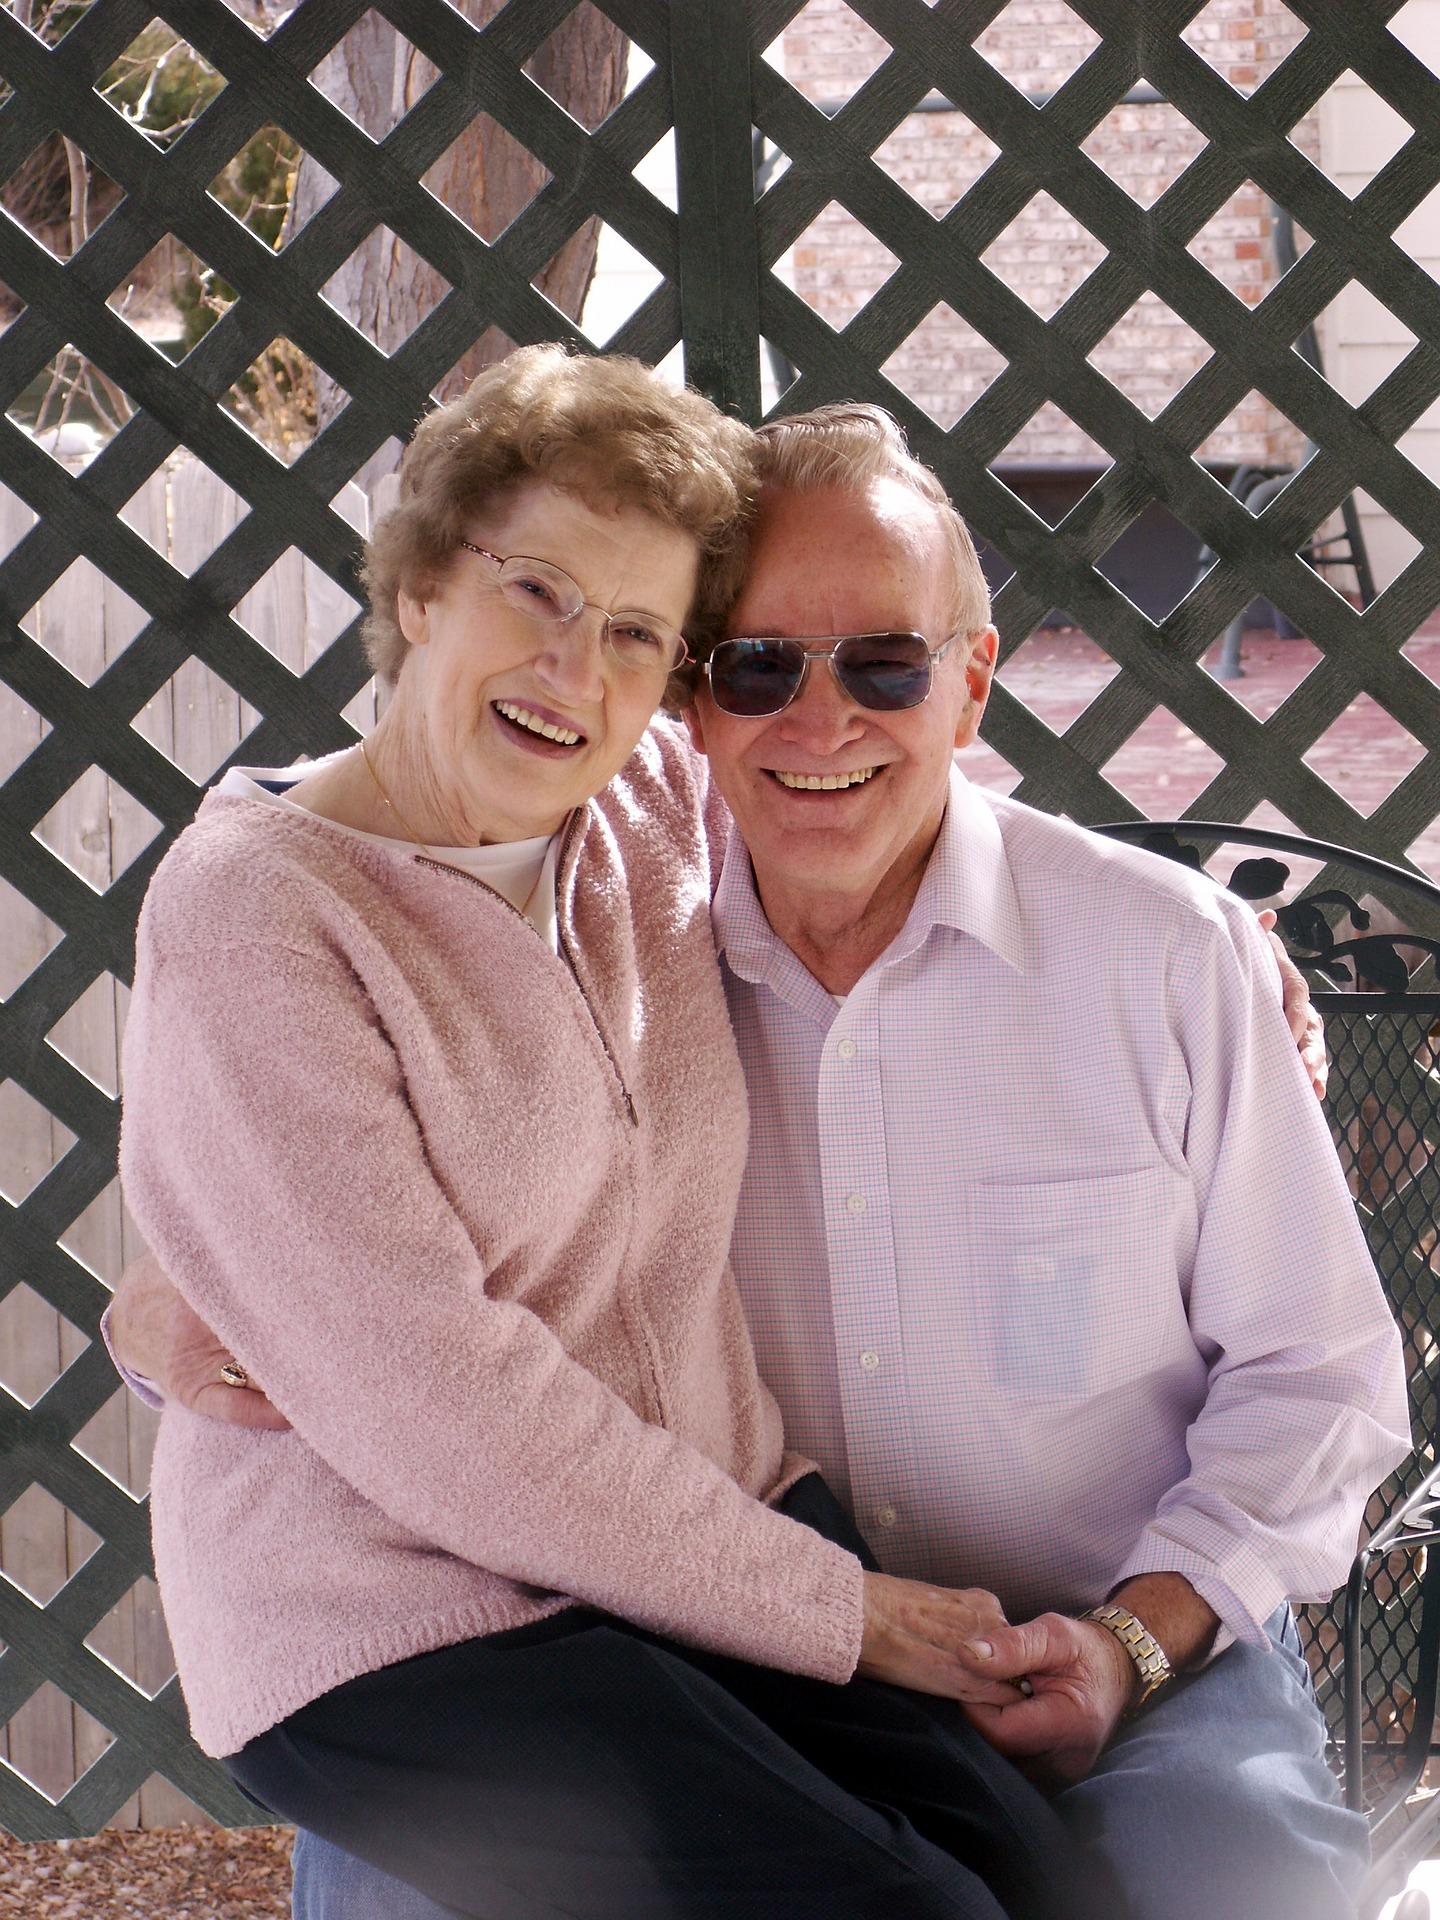 old-couple-2261495_1920_andreahamilton264